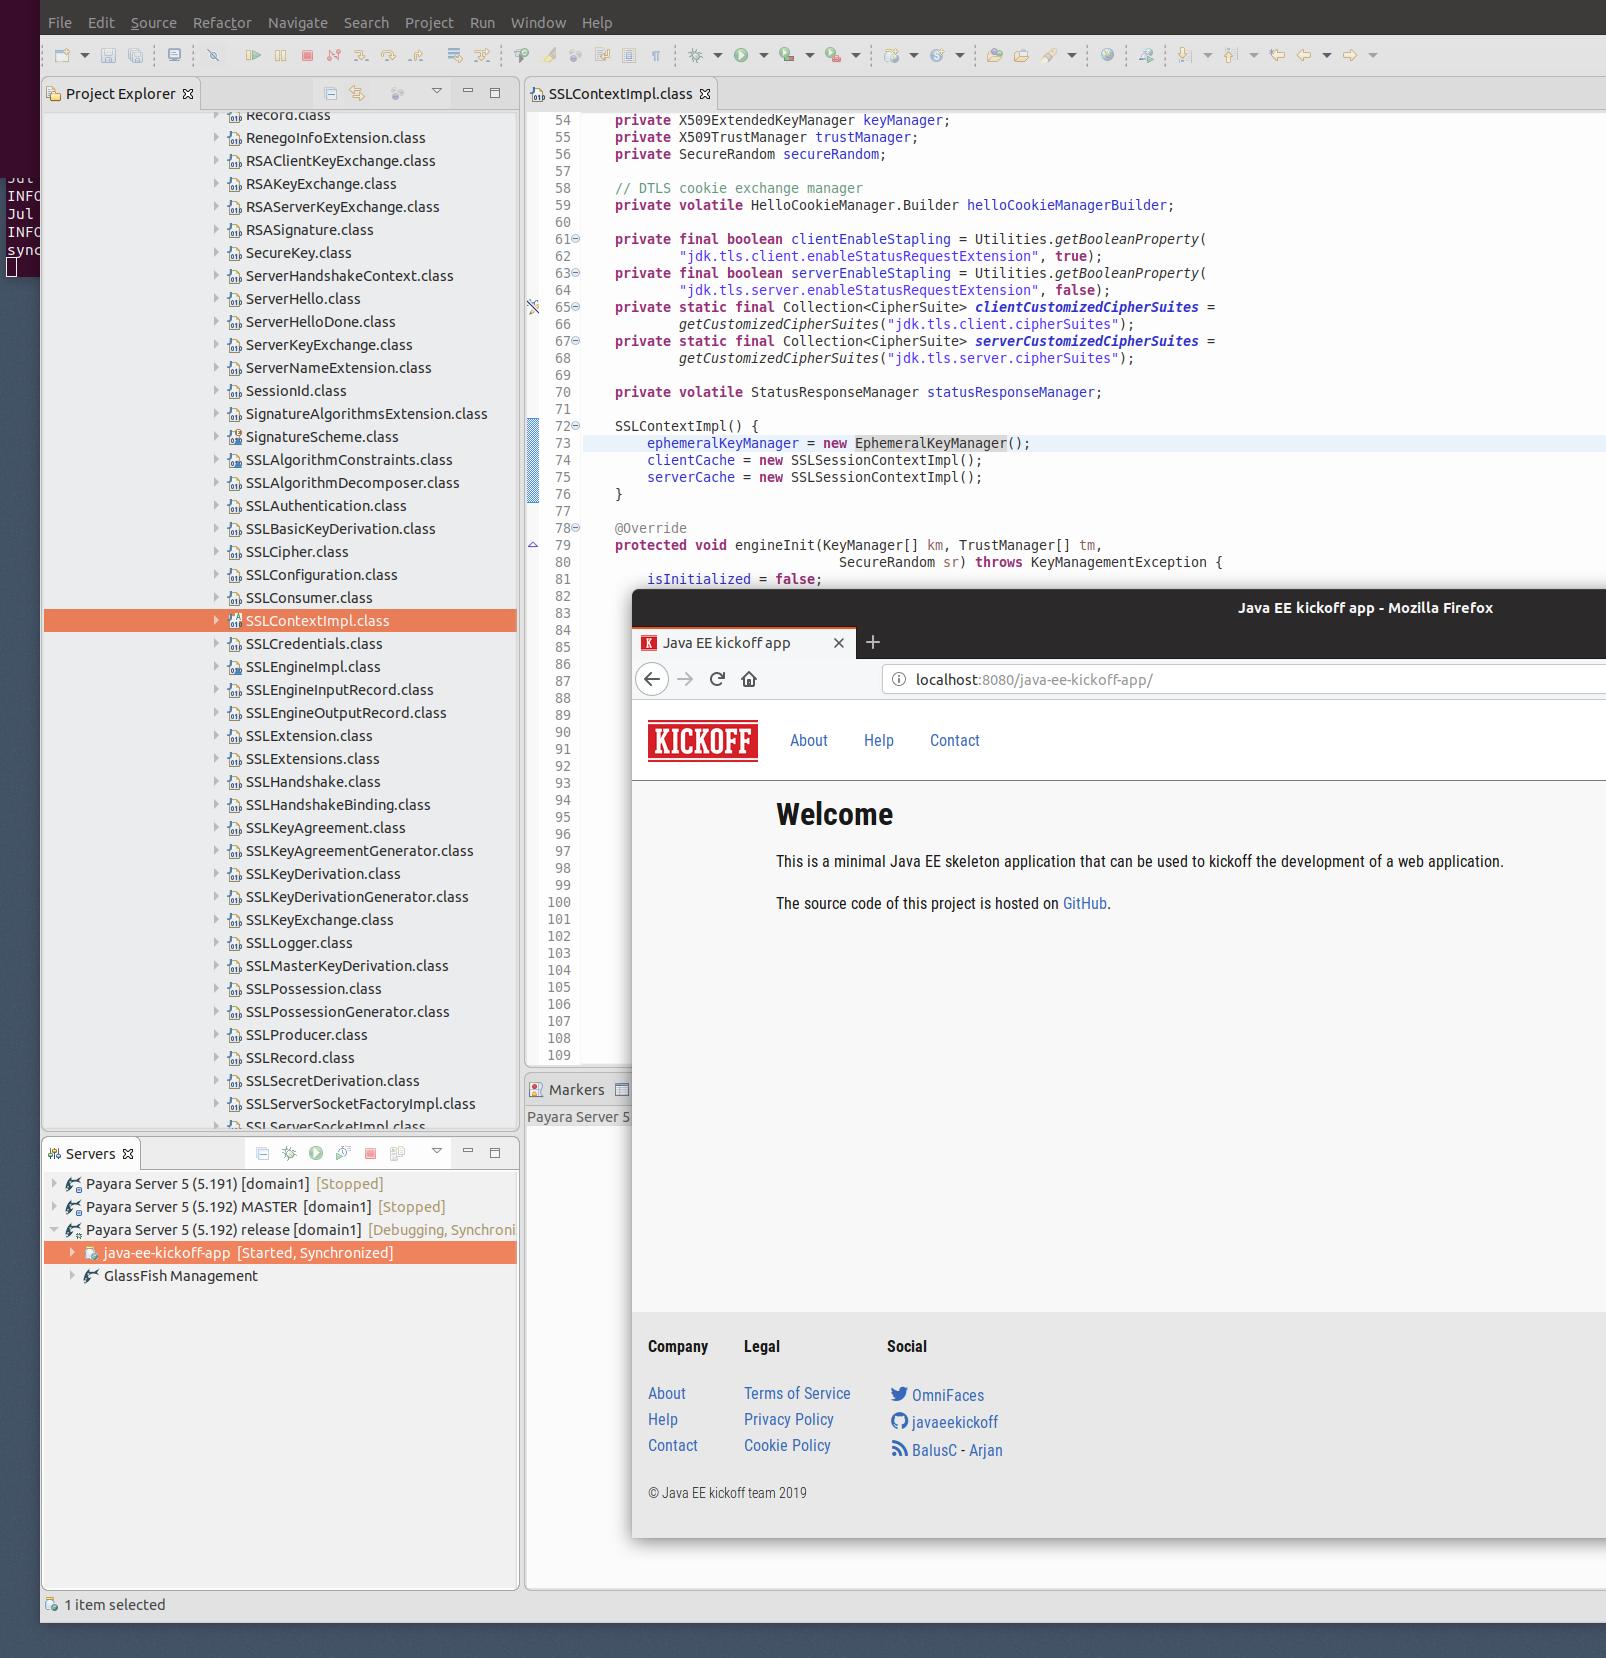 Payara Tools 1 0 - June 2019 - New for JDK 11 Users